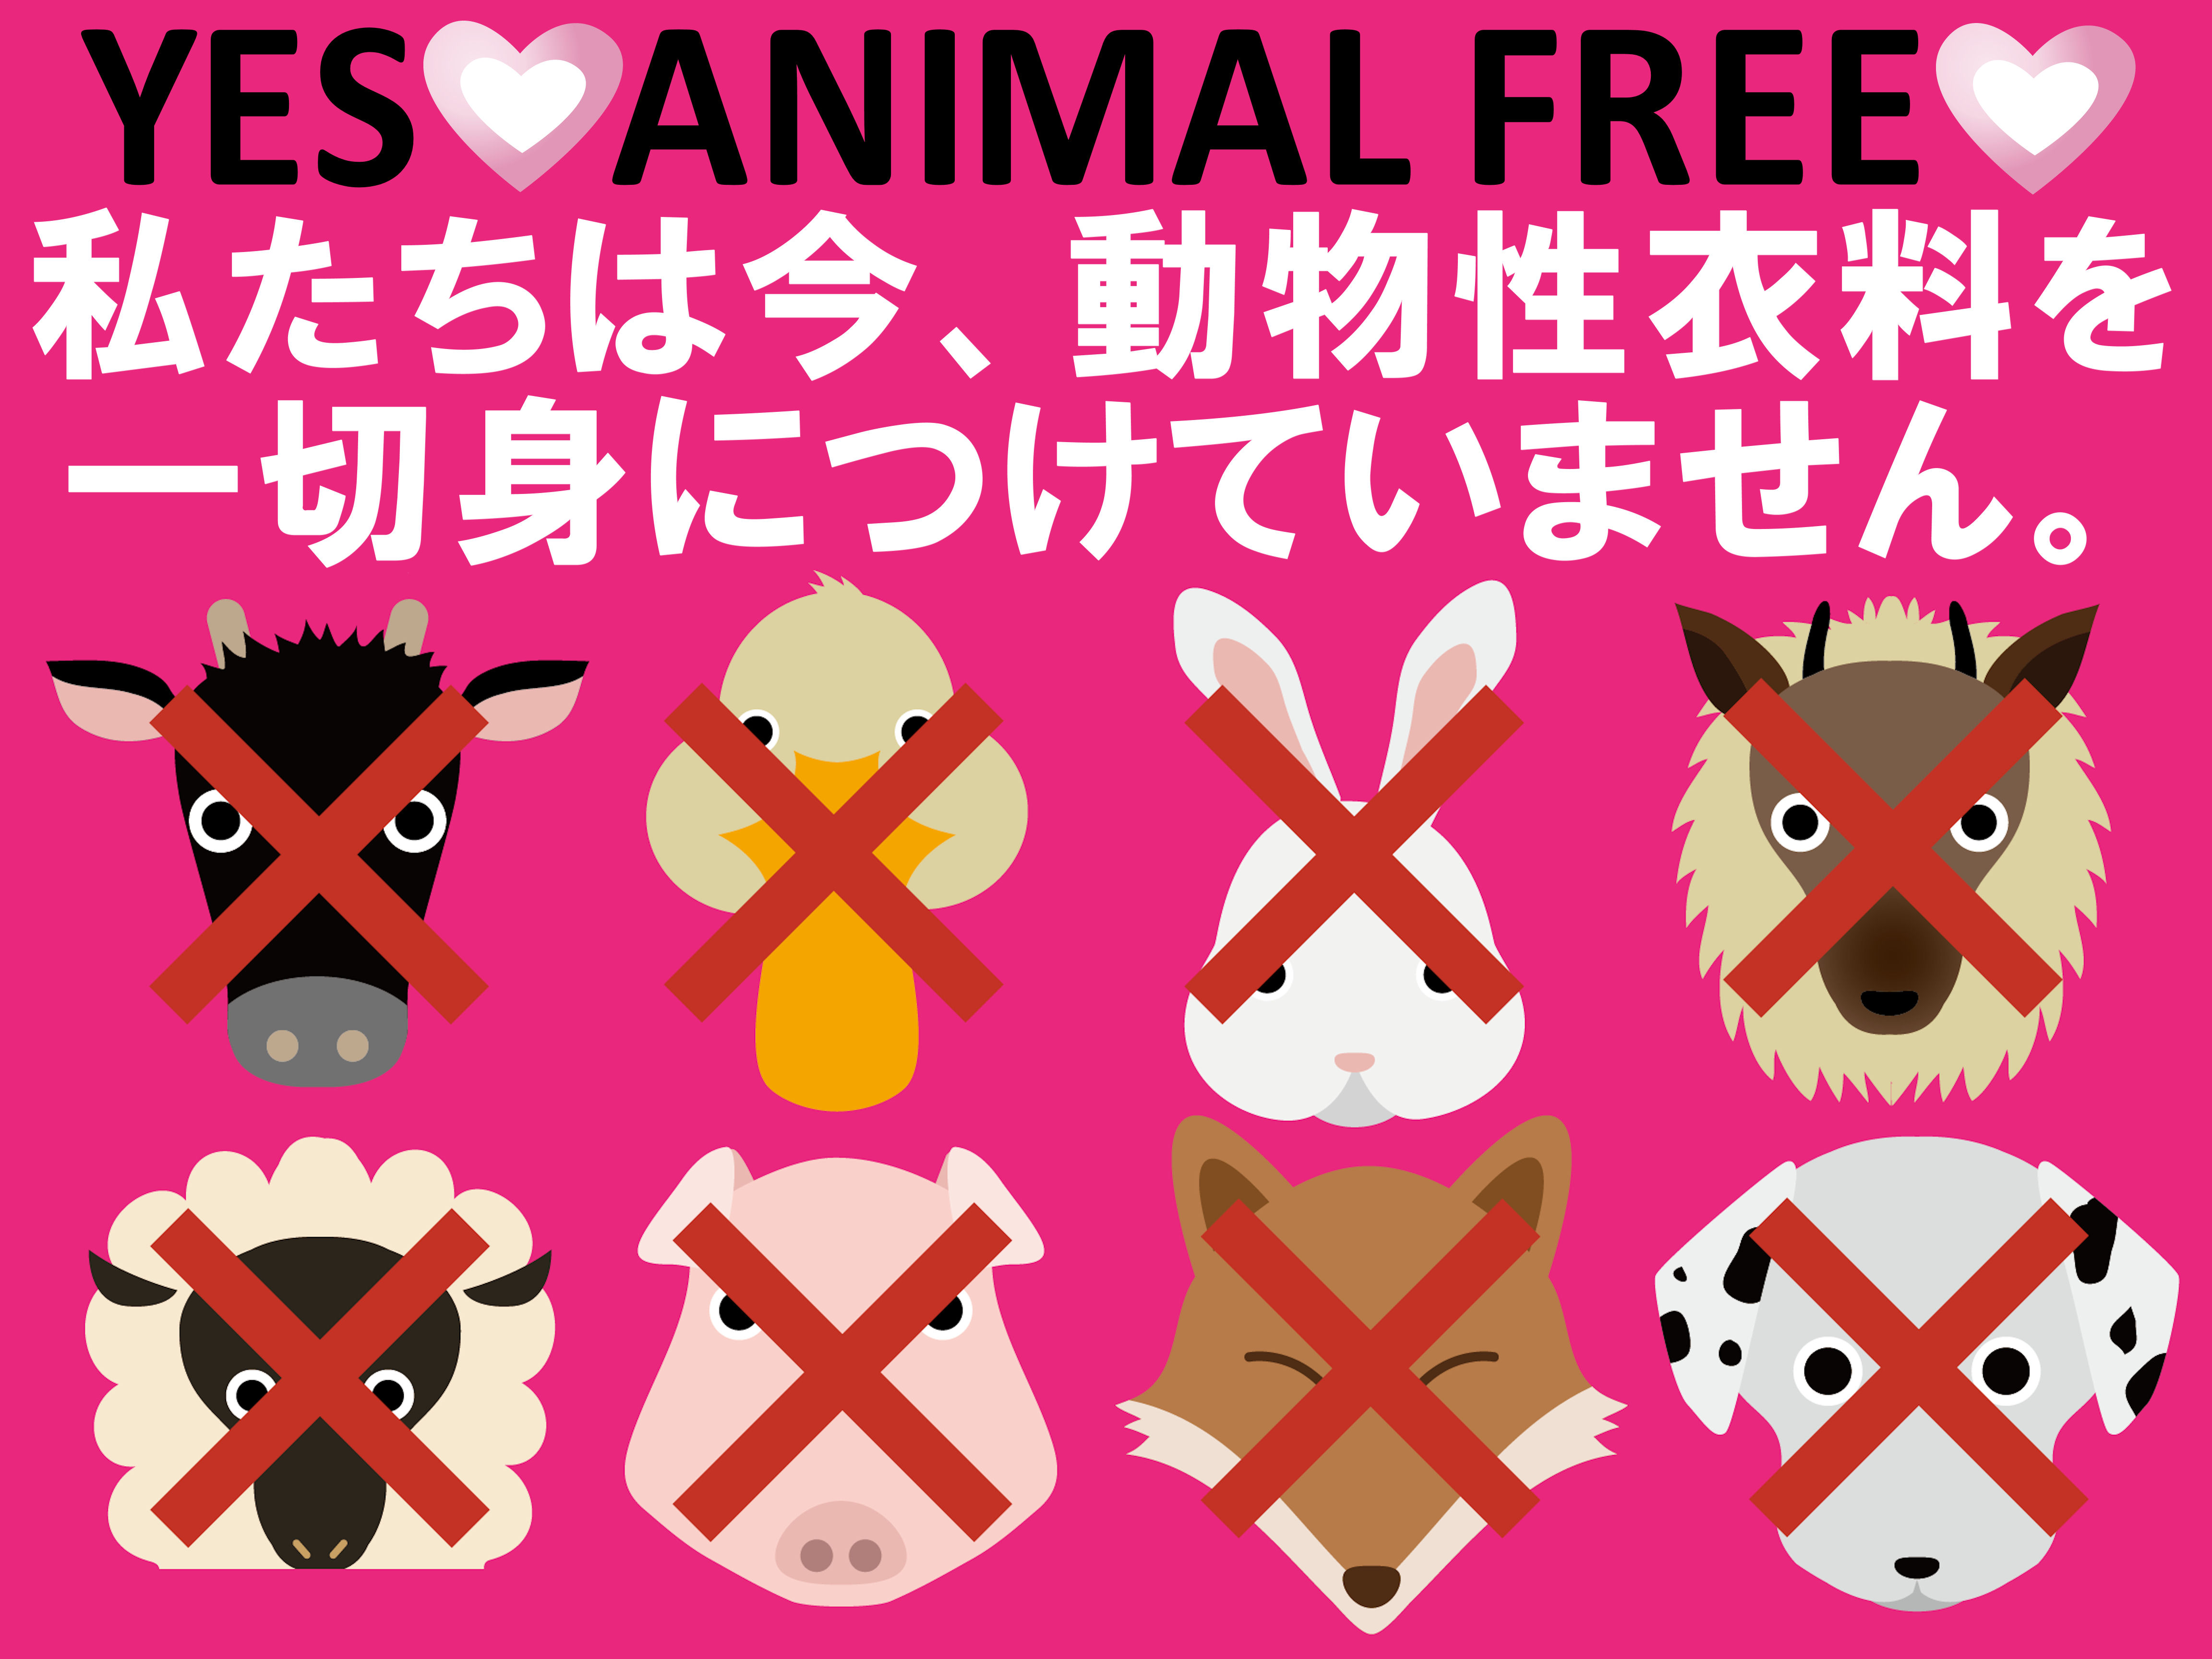 animalfreedemo13.jpg